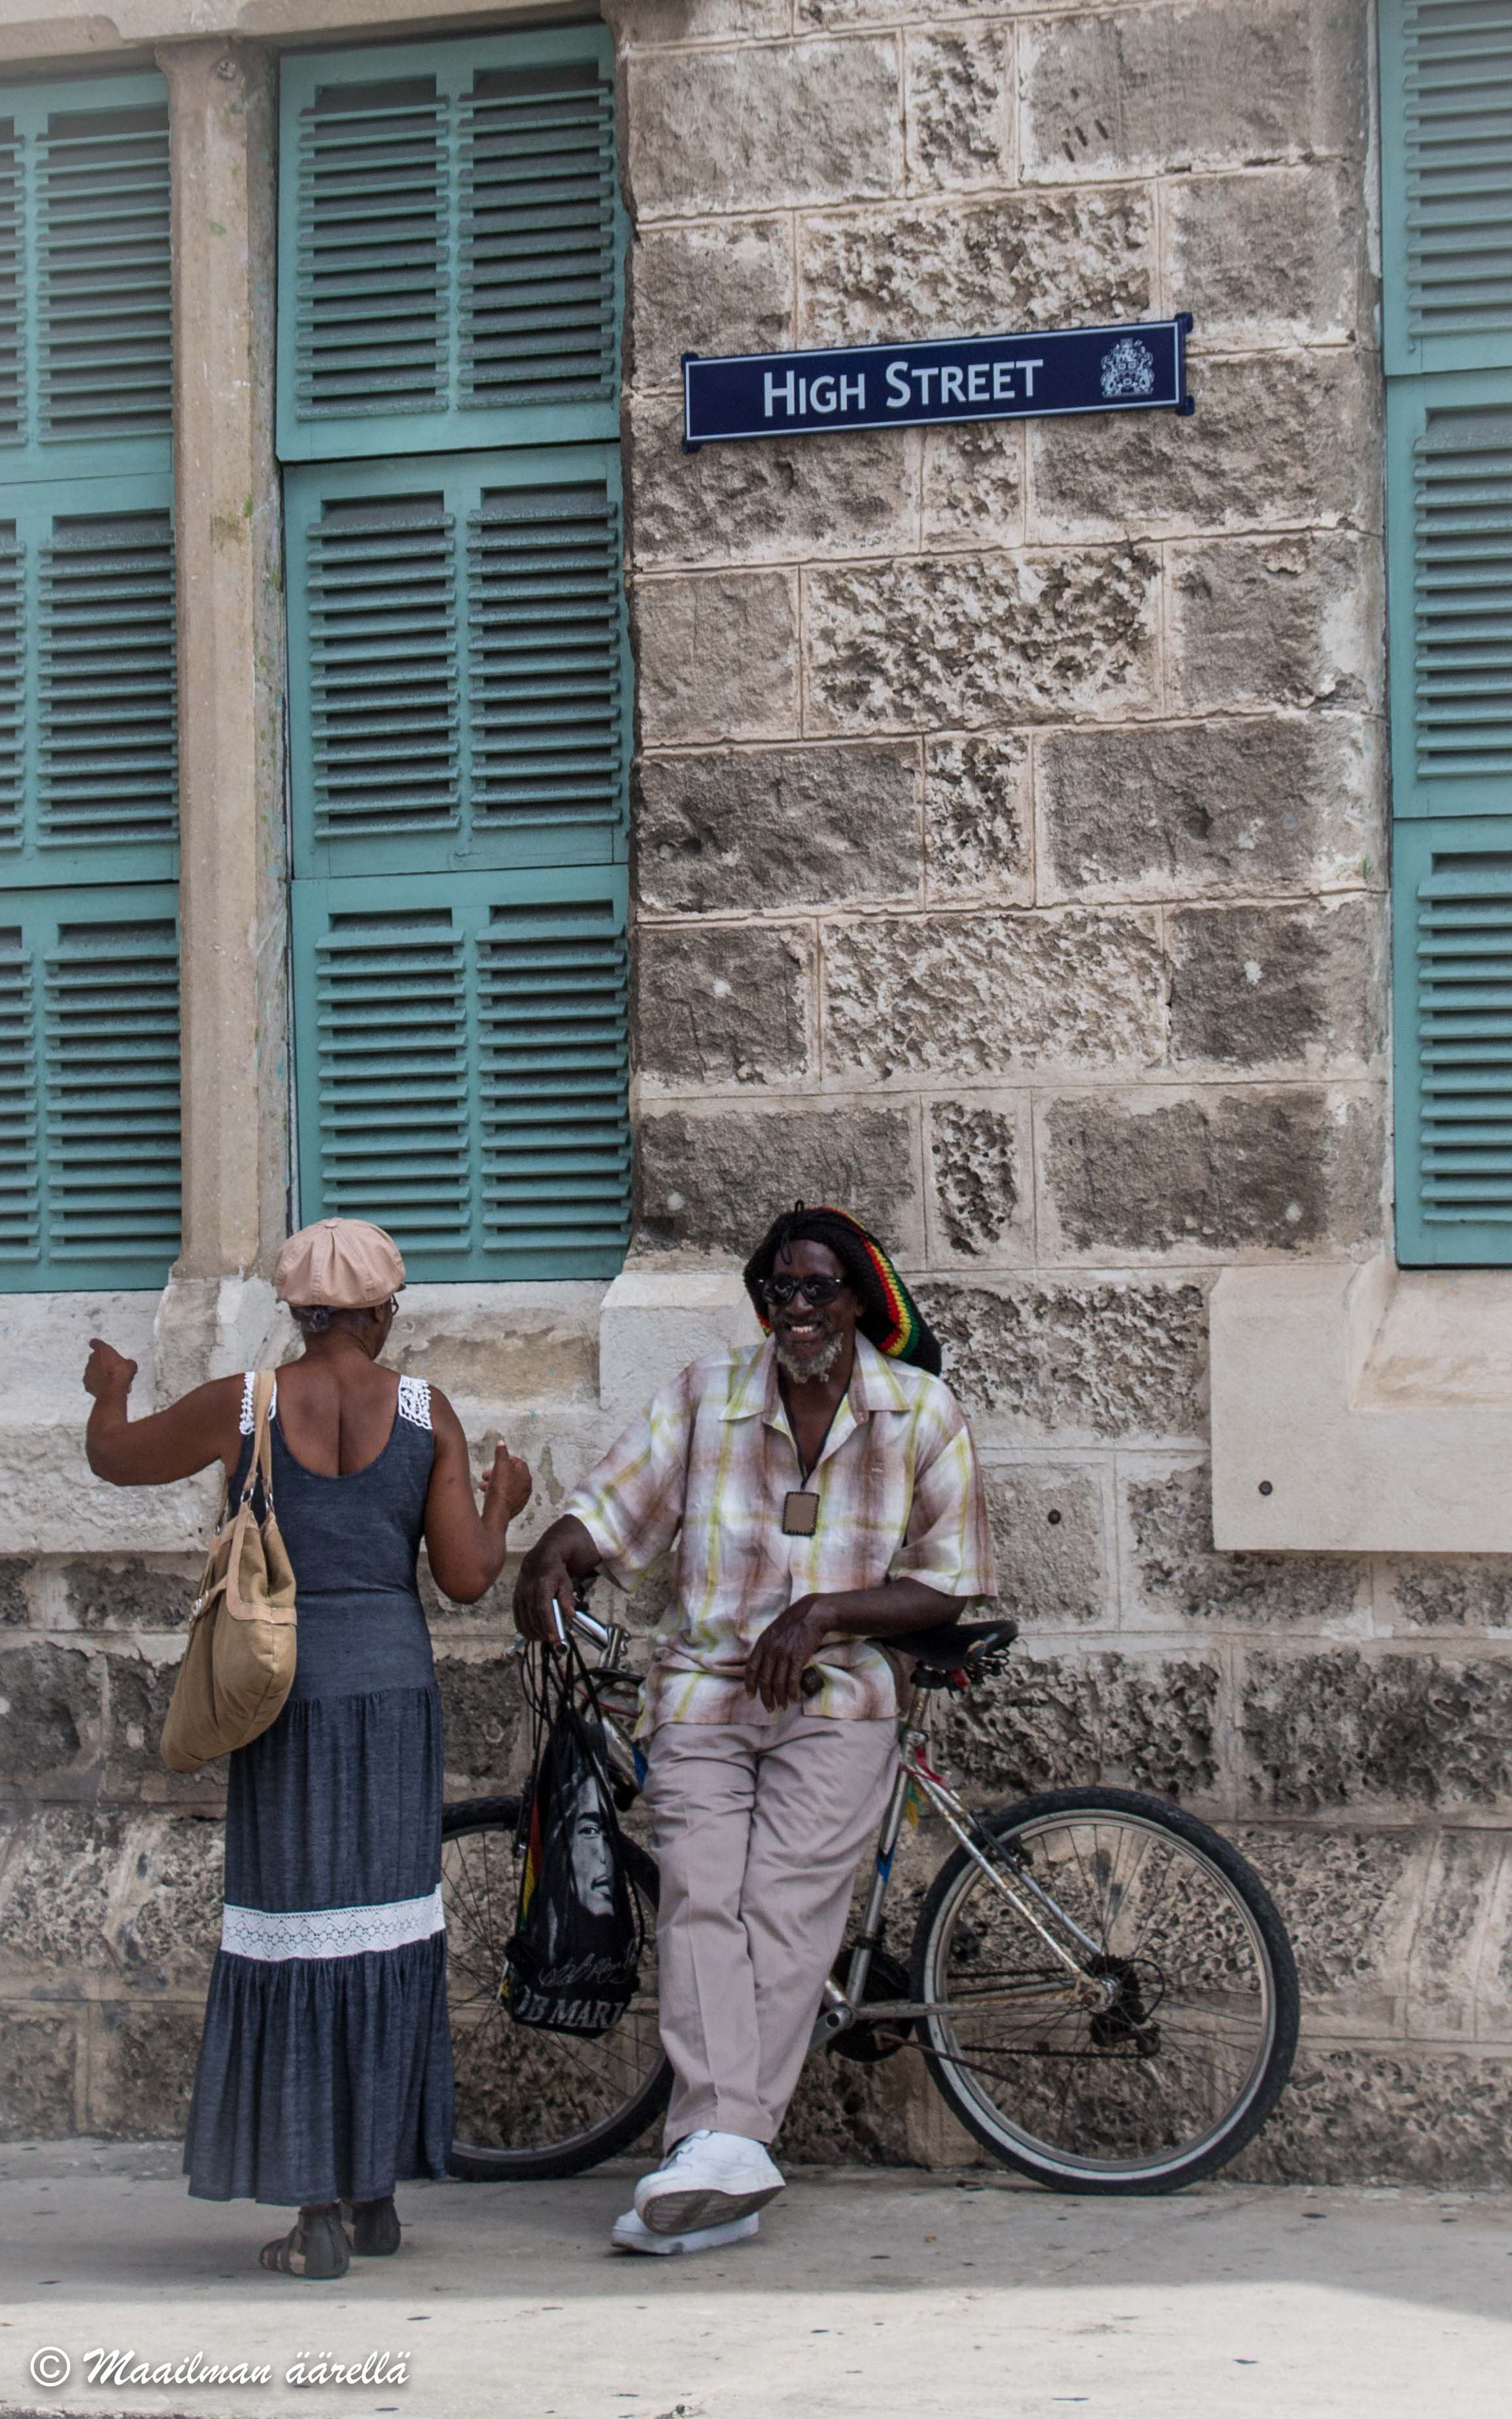 Btidgetown Barbados